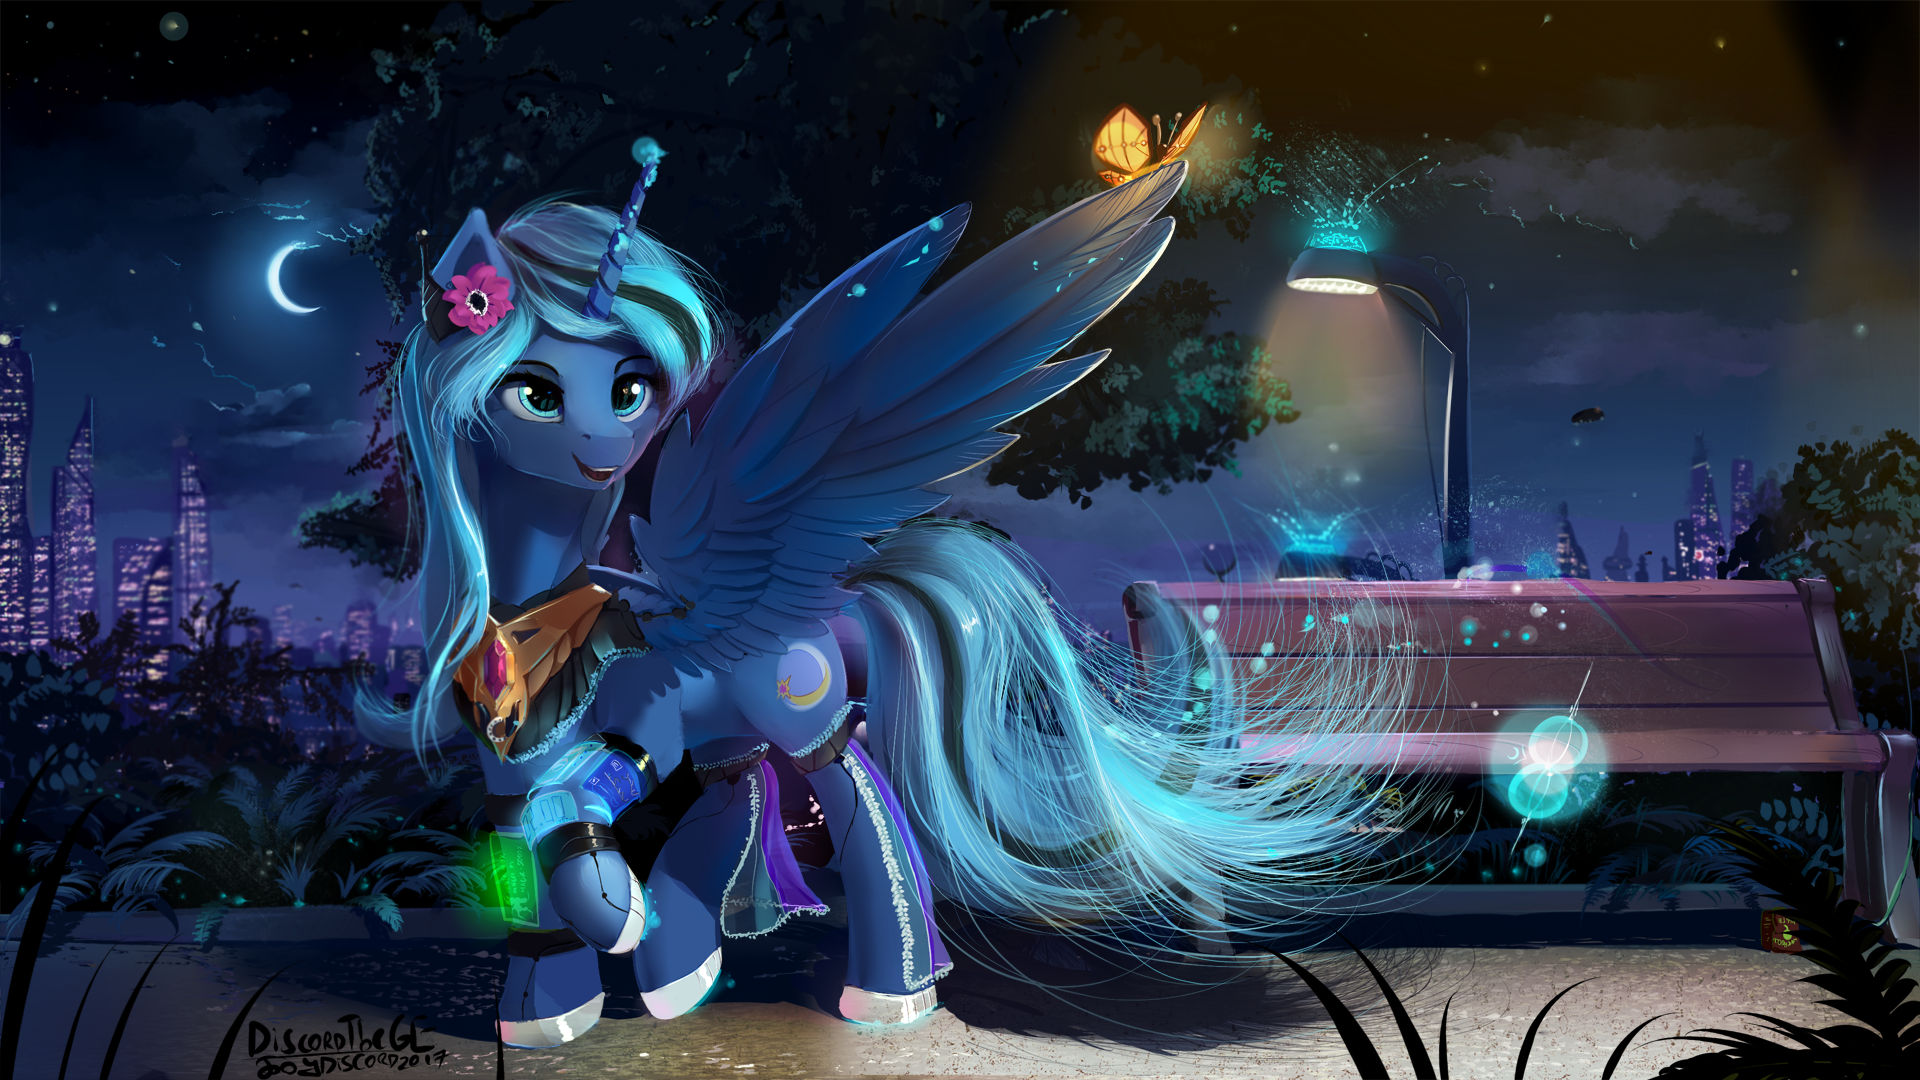 Moonlight Effect